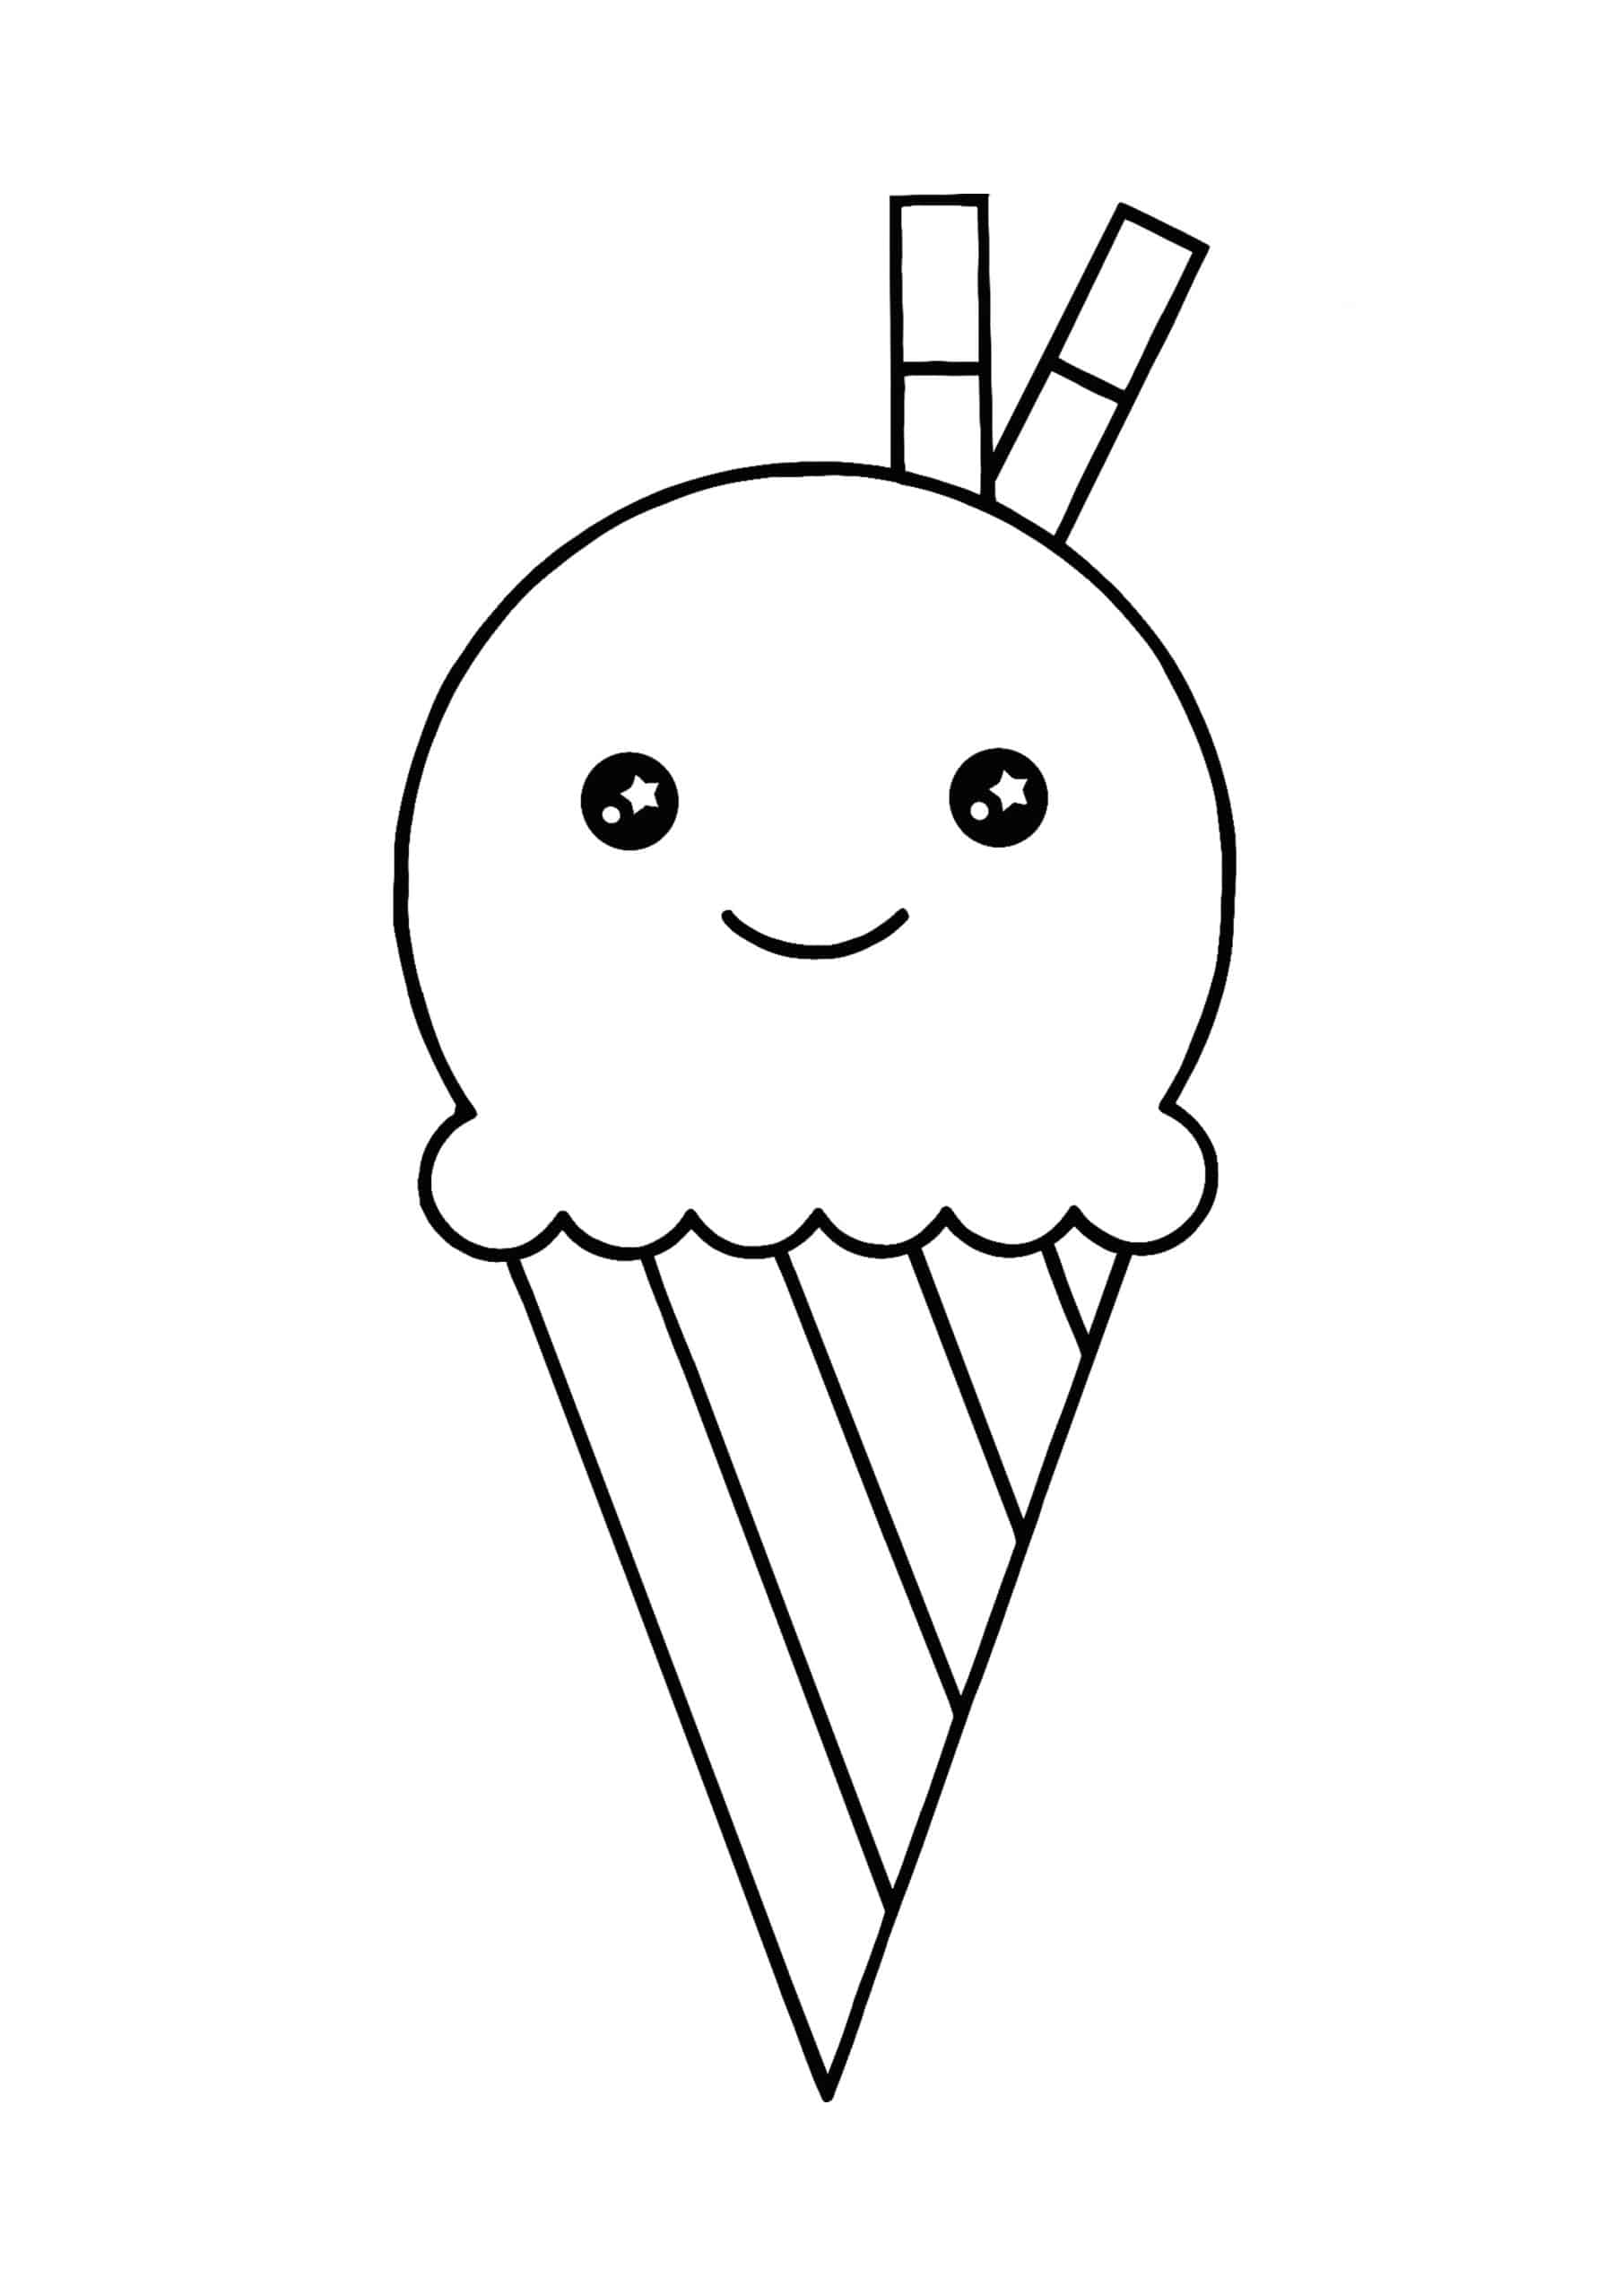 Kawaii Ice Cream coloring page